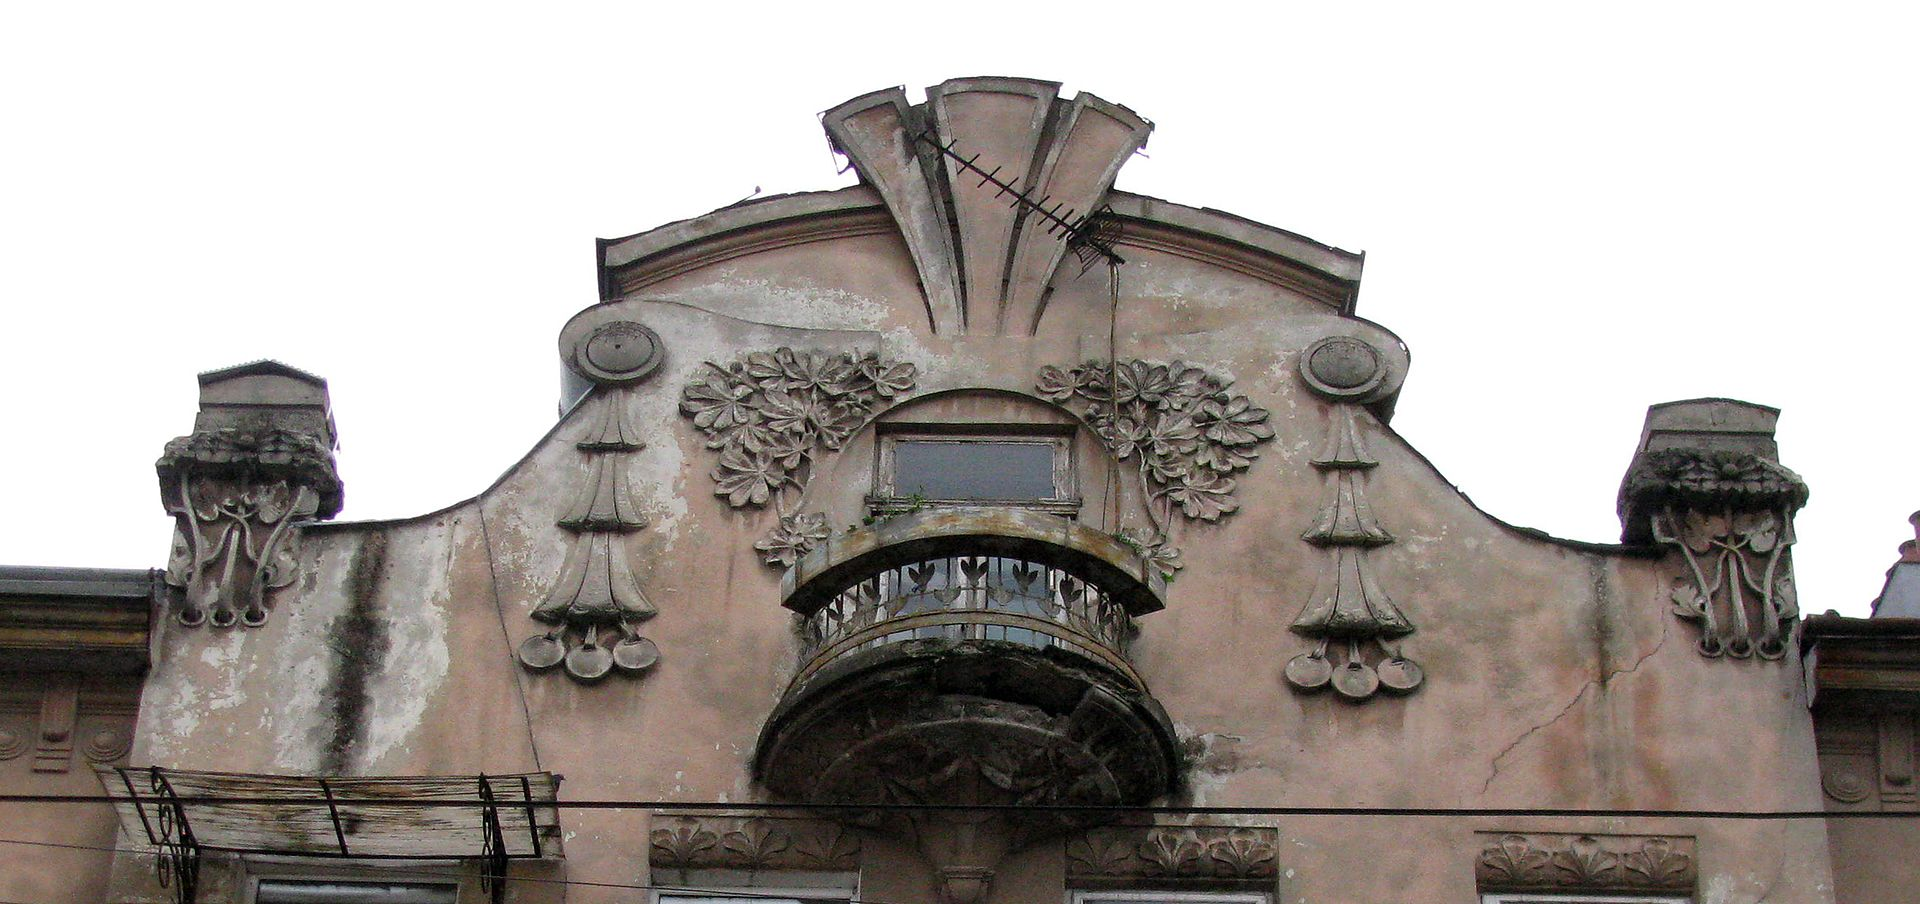 13_Nechuia-Levytskoho_Street,_Lviv_(04).jpg